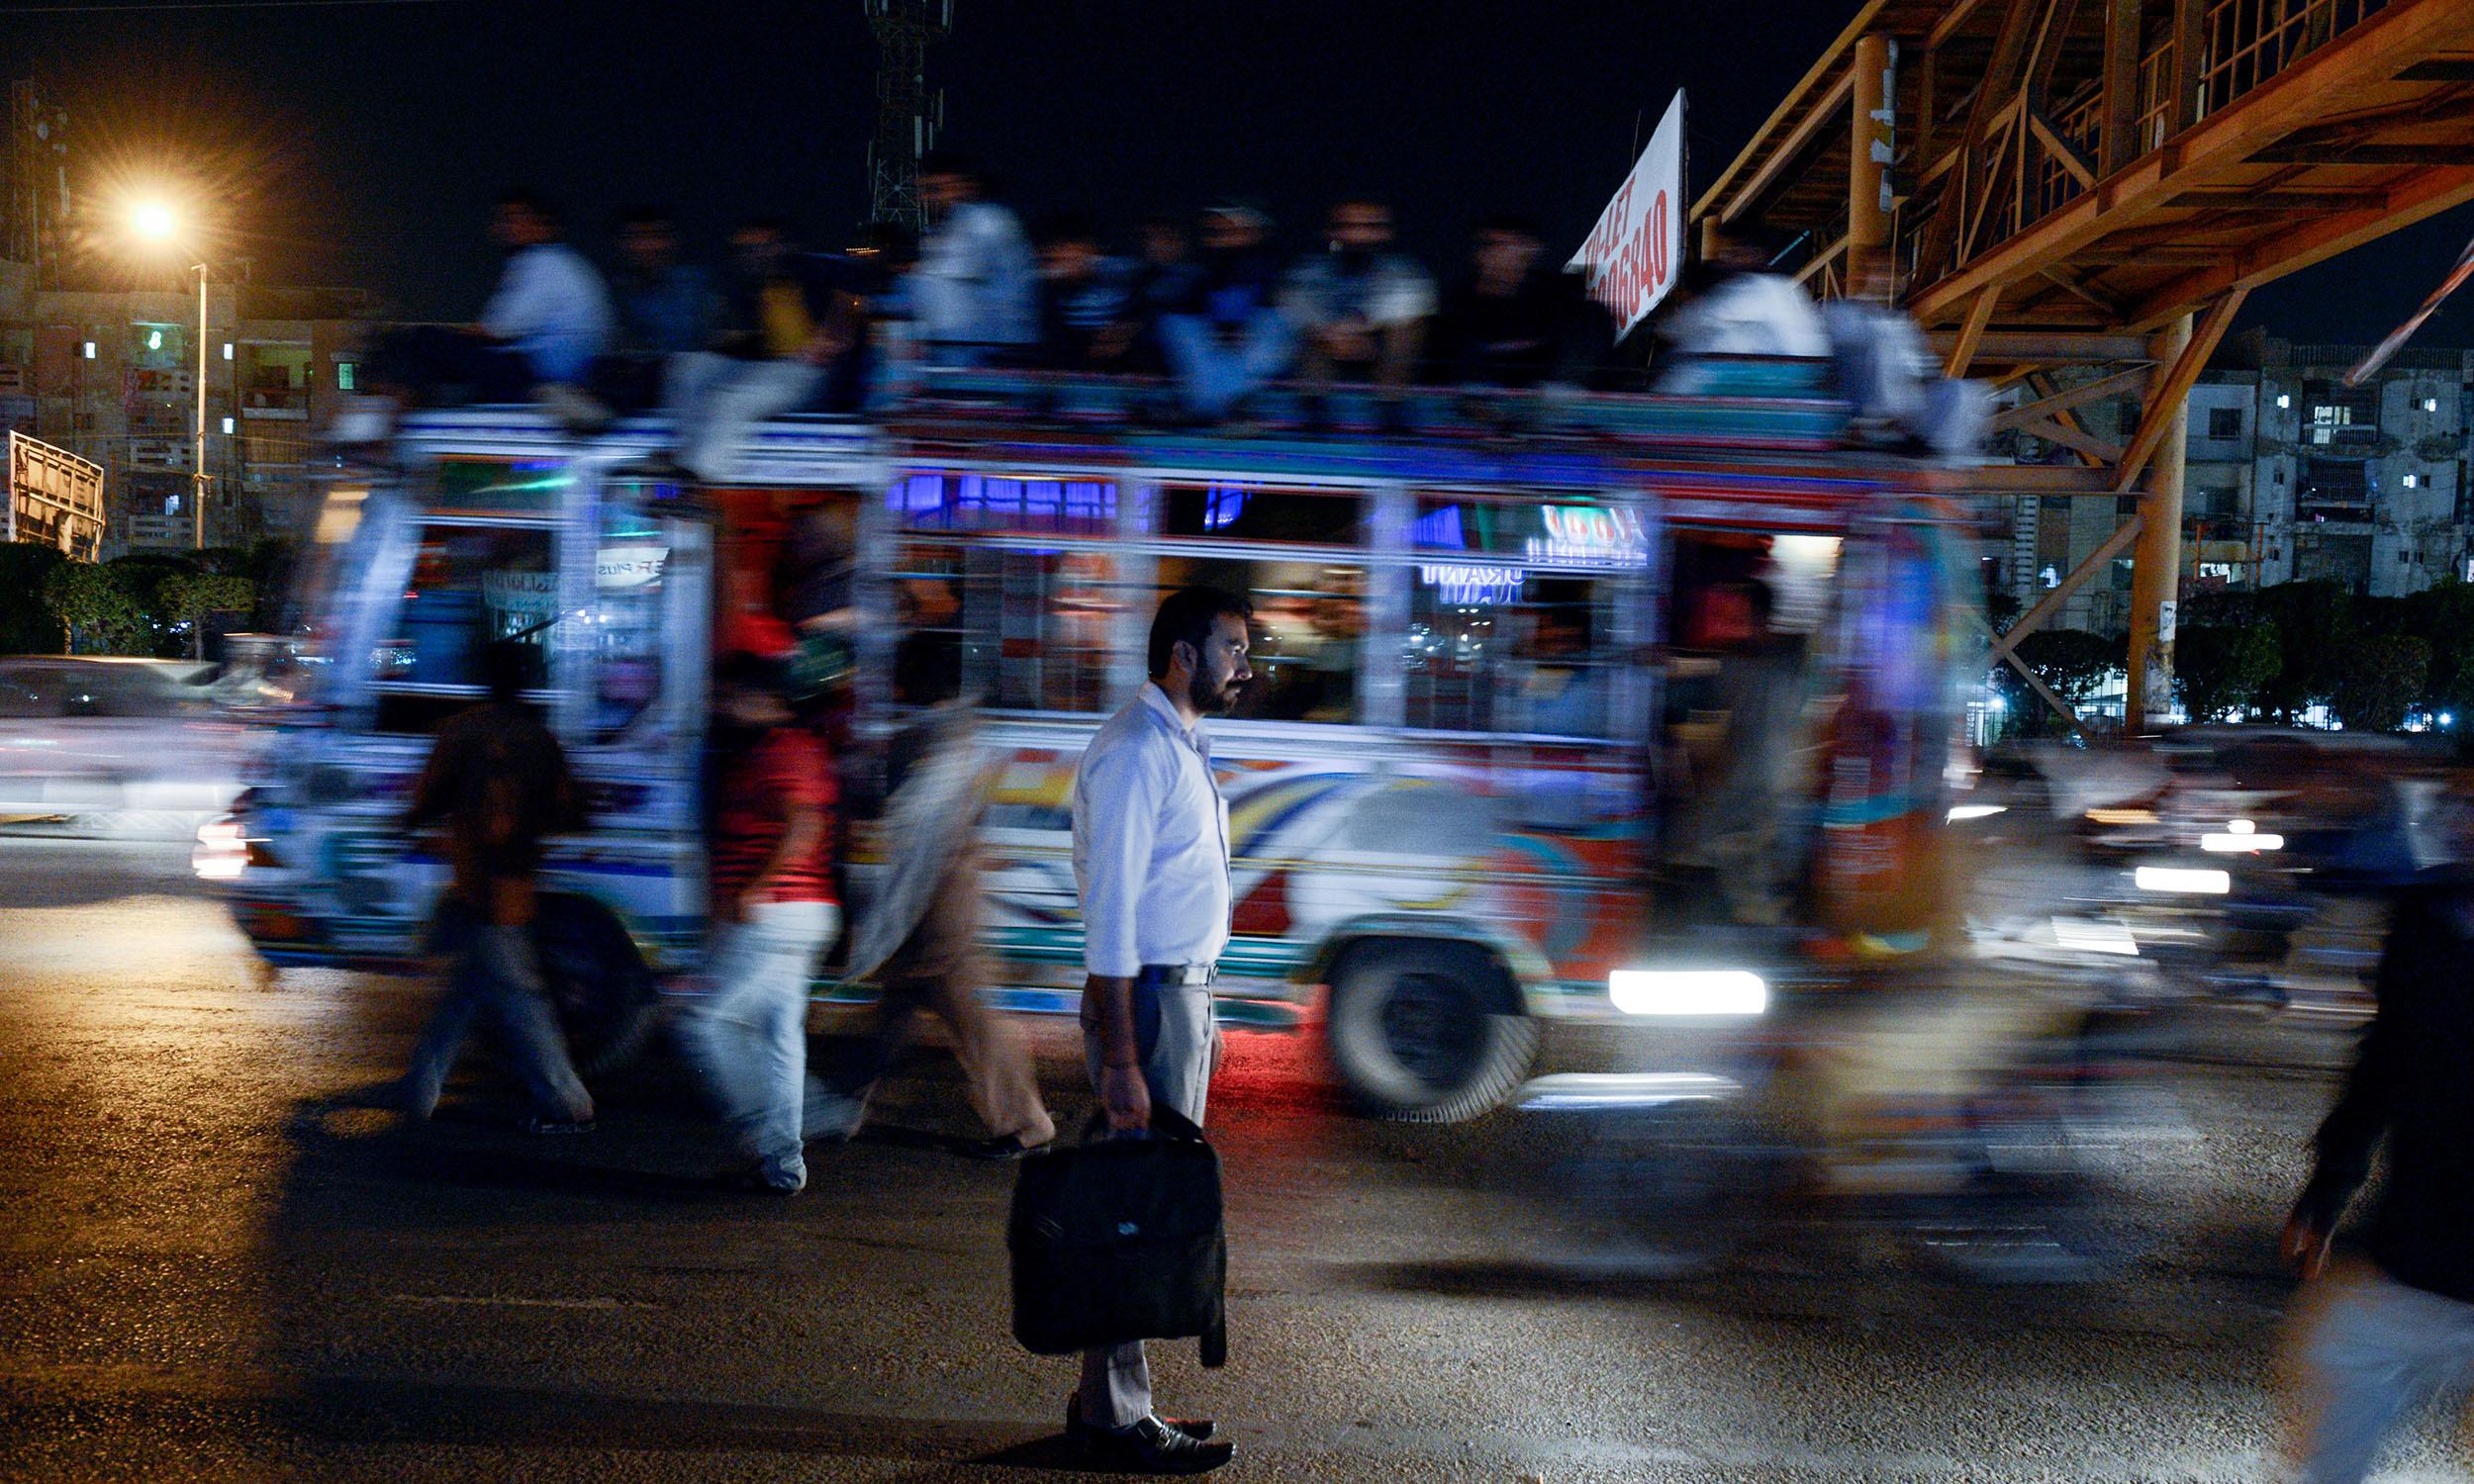 A man during his commute in Karachi | Tahir Jamal, White Star